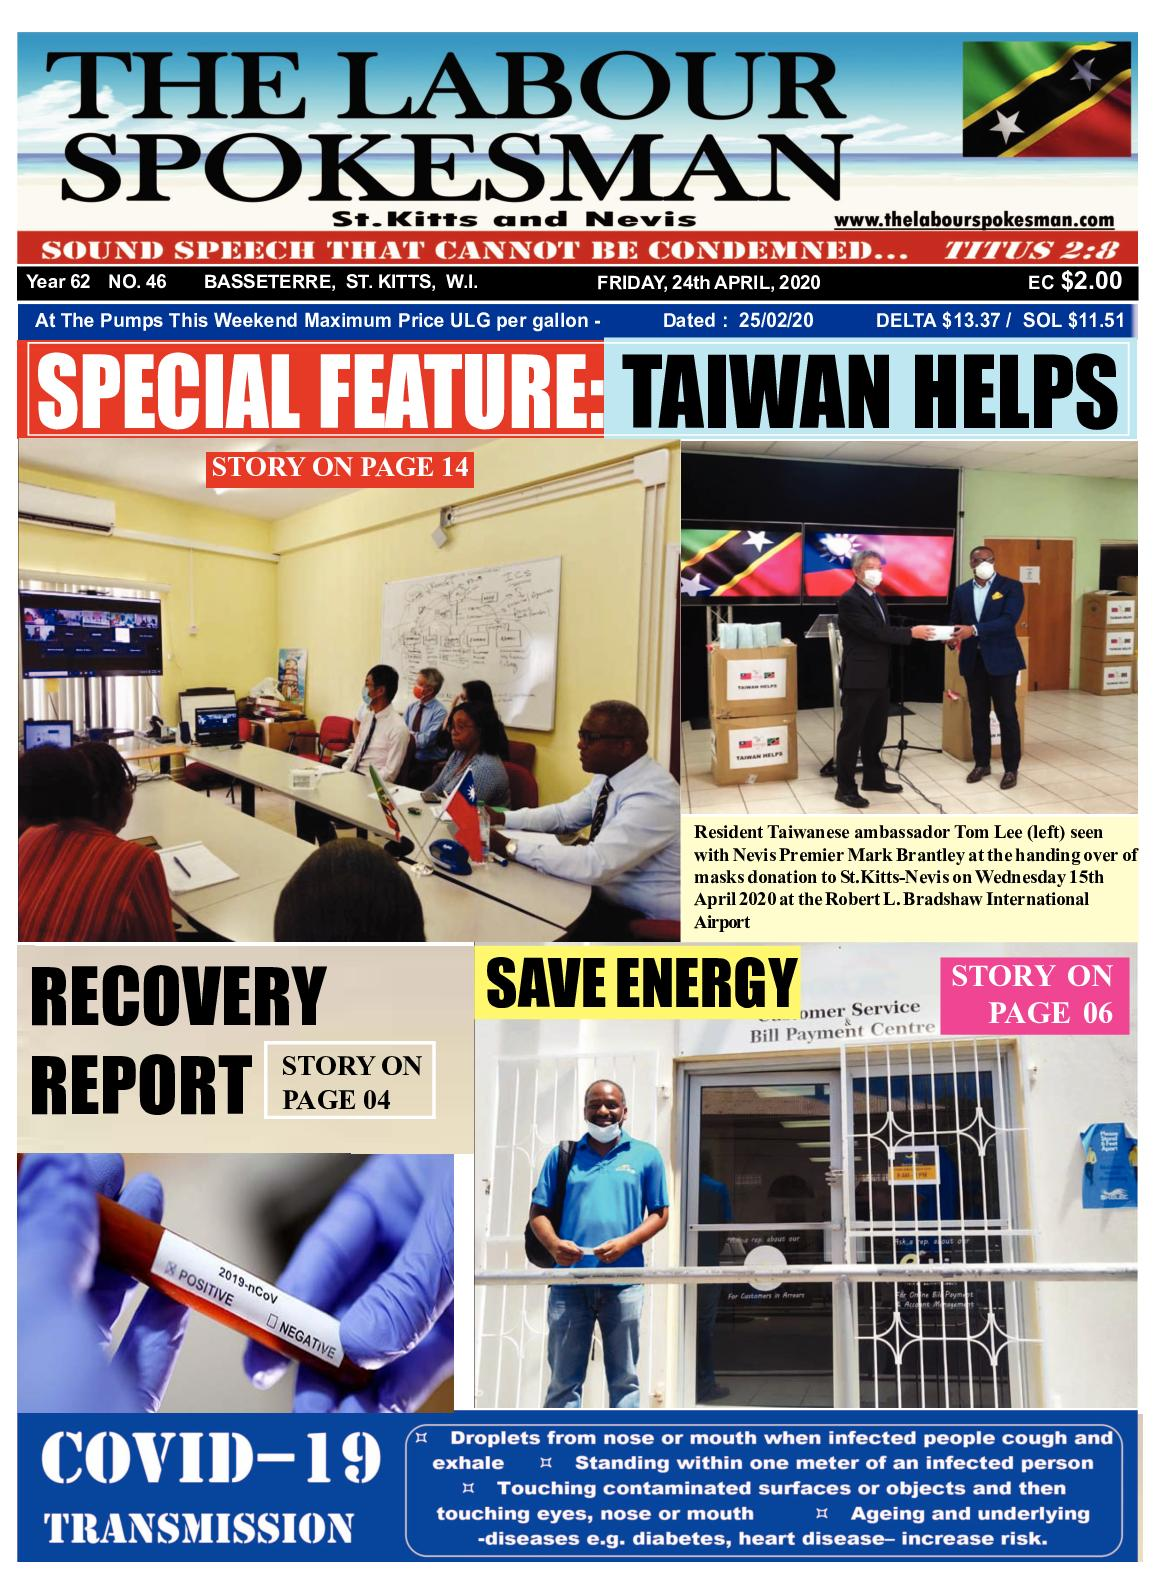 Calaméo - The Labour Spokesman: April 24th 2020